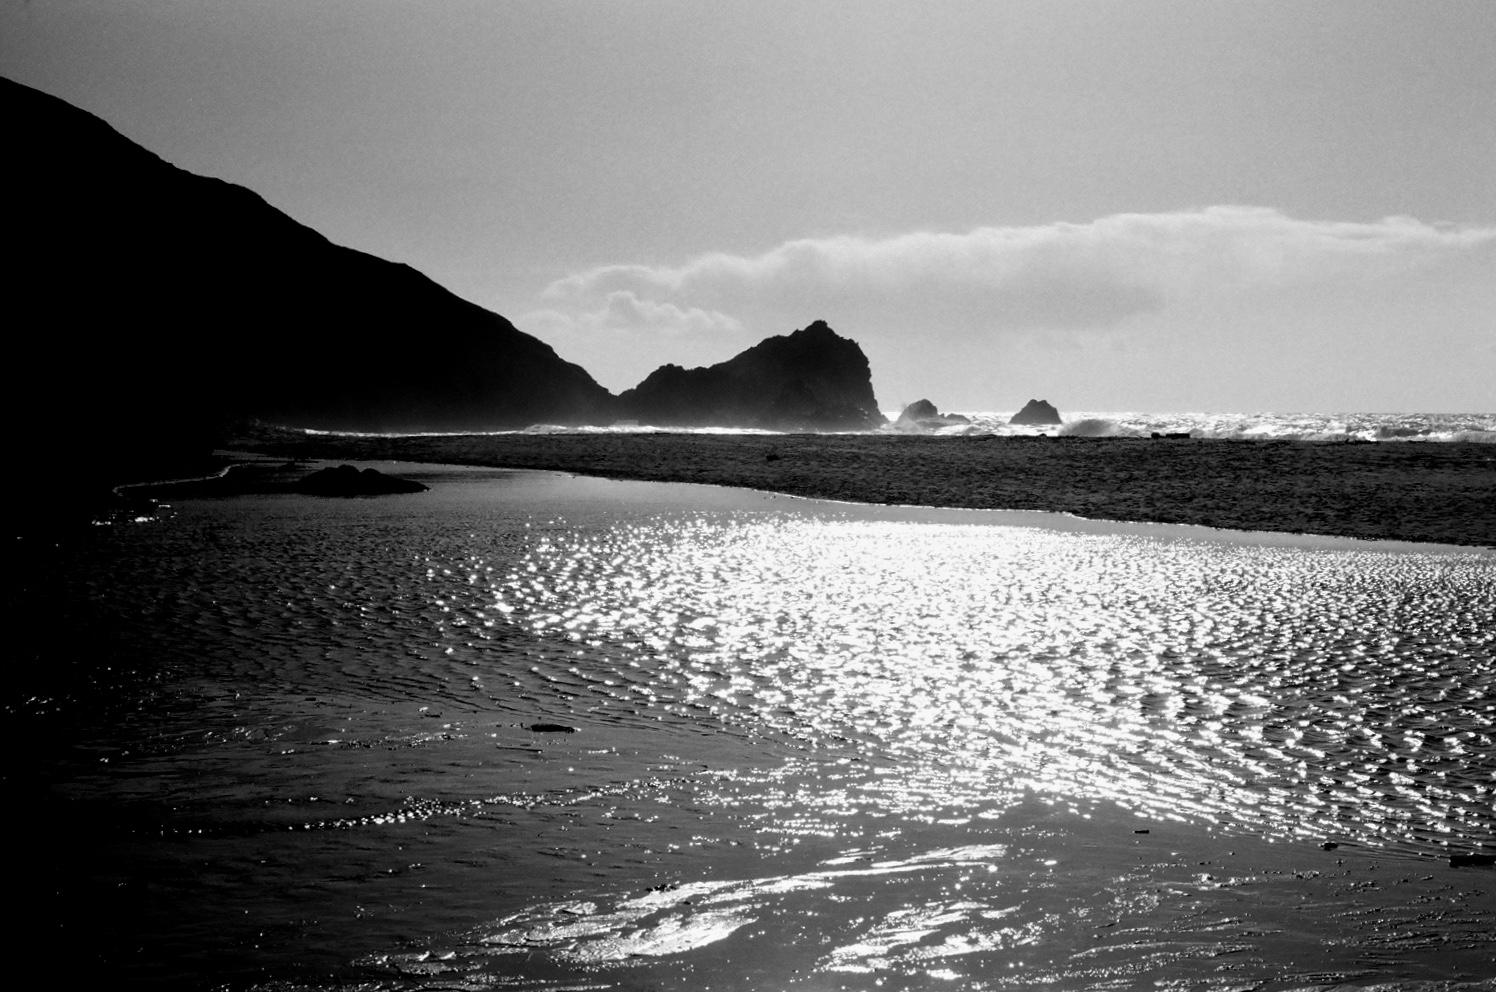 McClure's Beach at Pierce Point Ranch, Pt. Reyes National Seashore